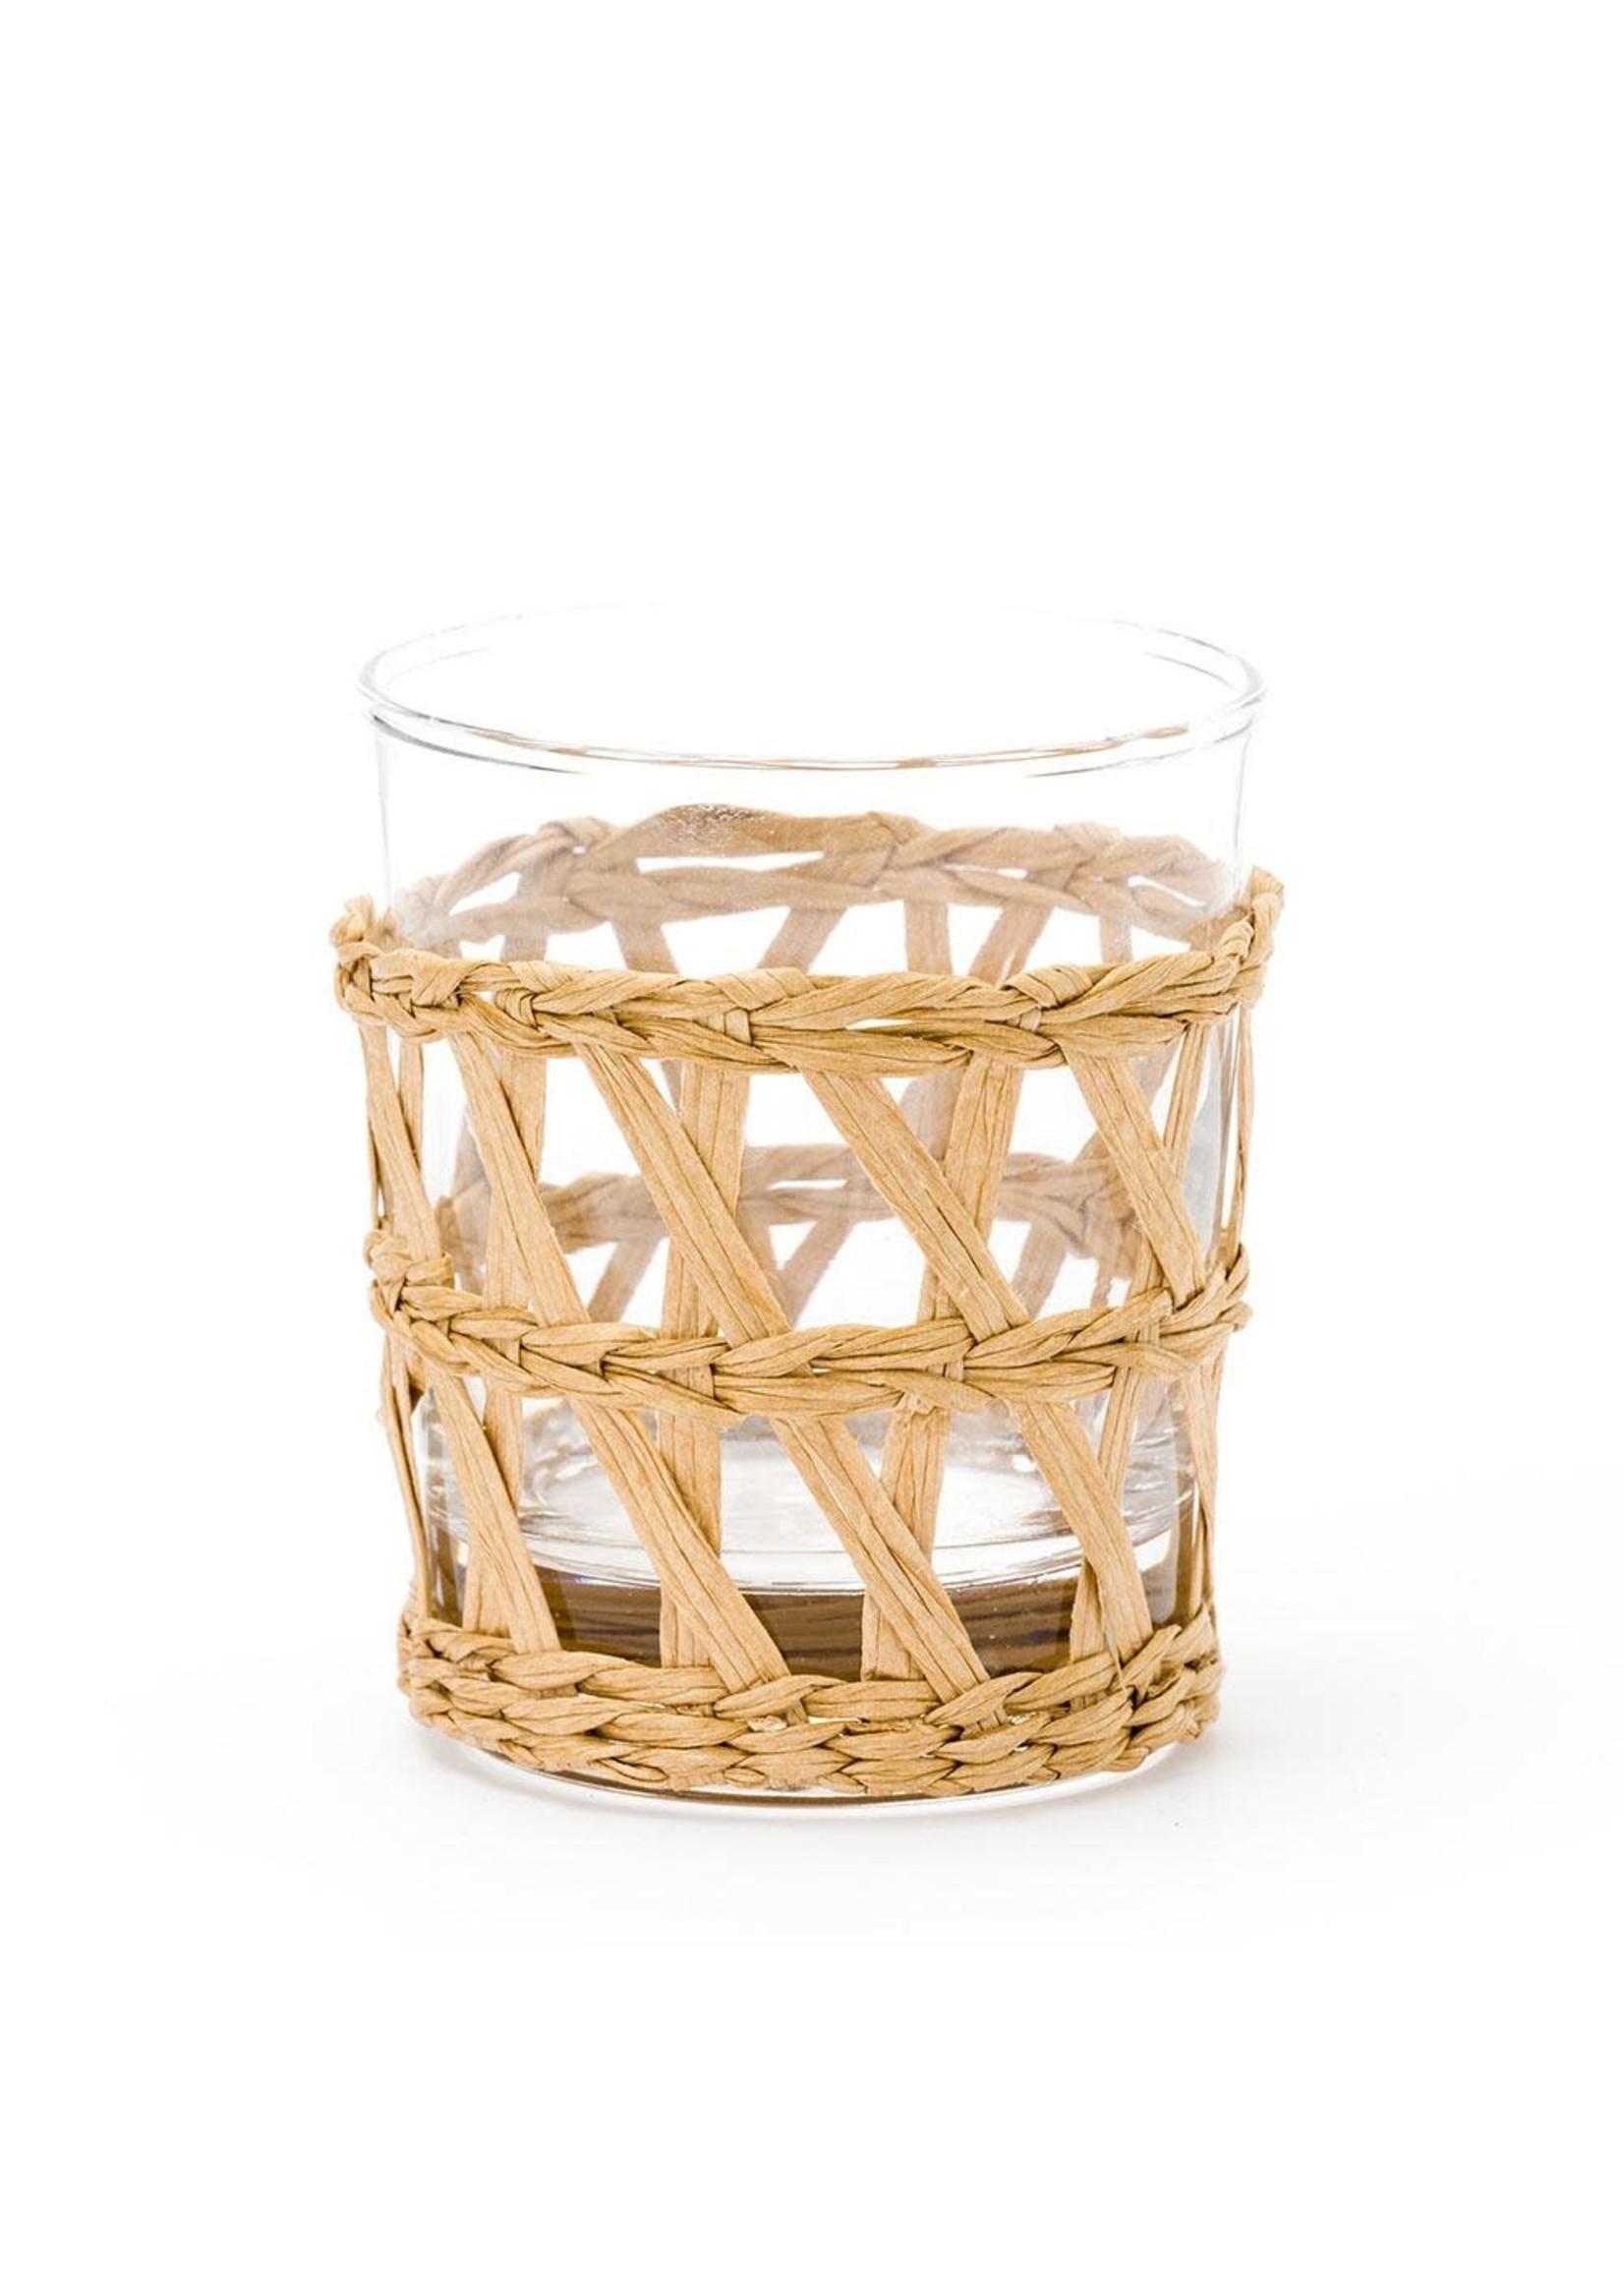 Amanda Lindroth Island Wrapped Tumbler Glass - Natural